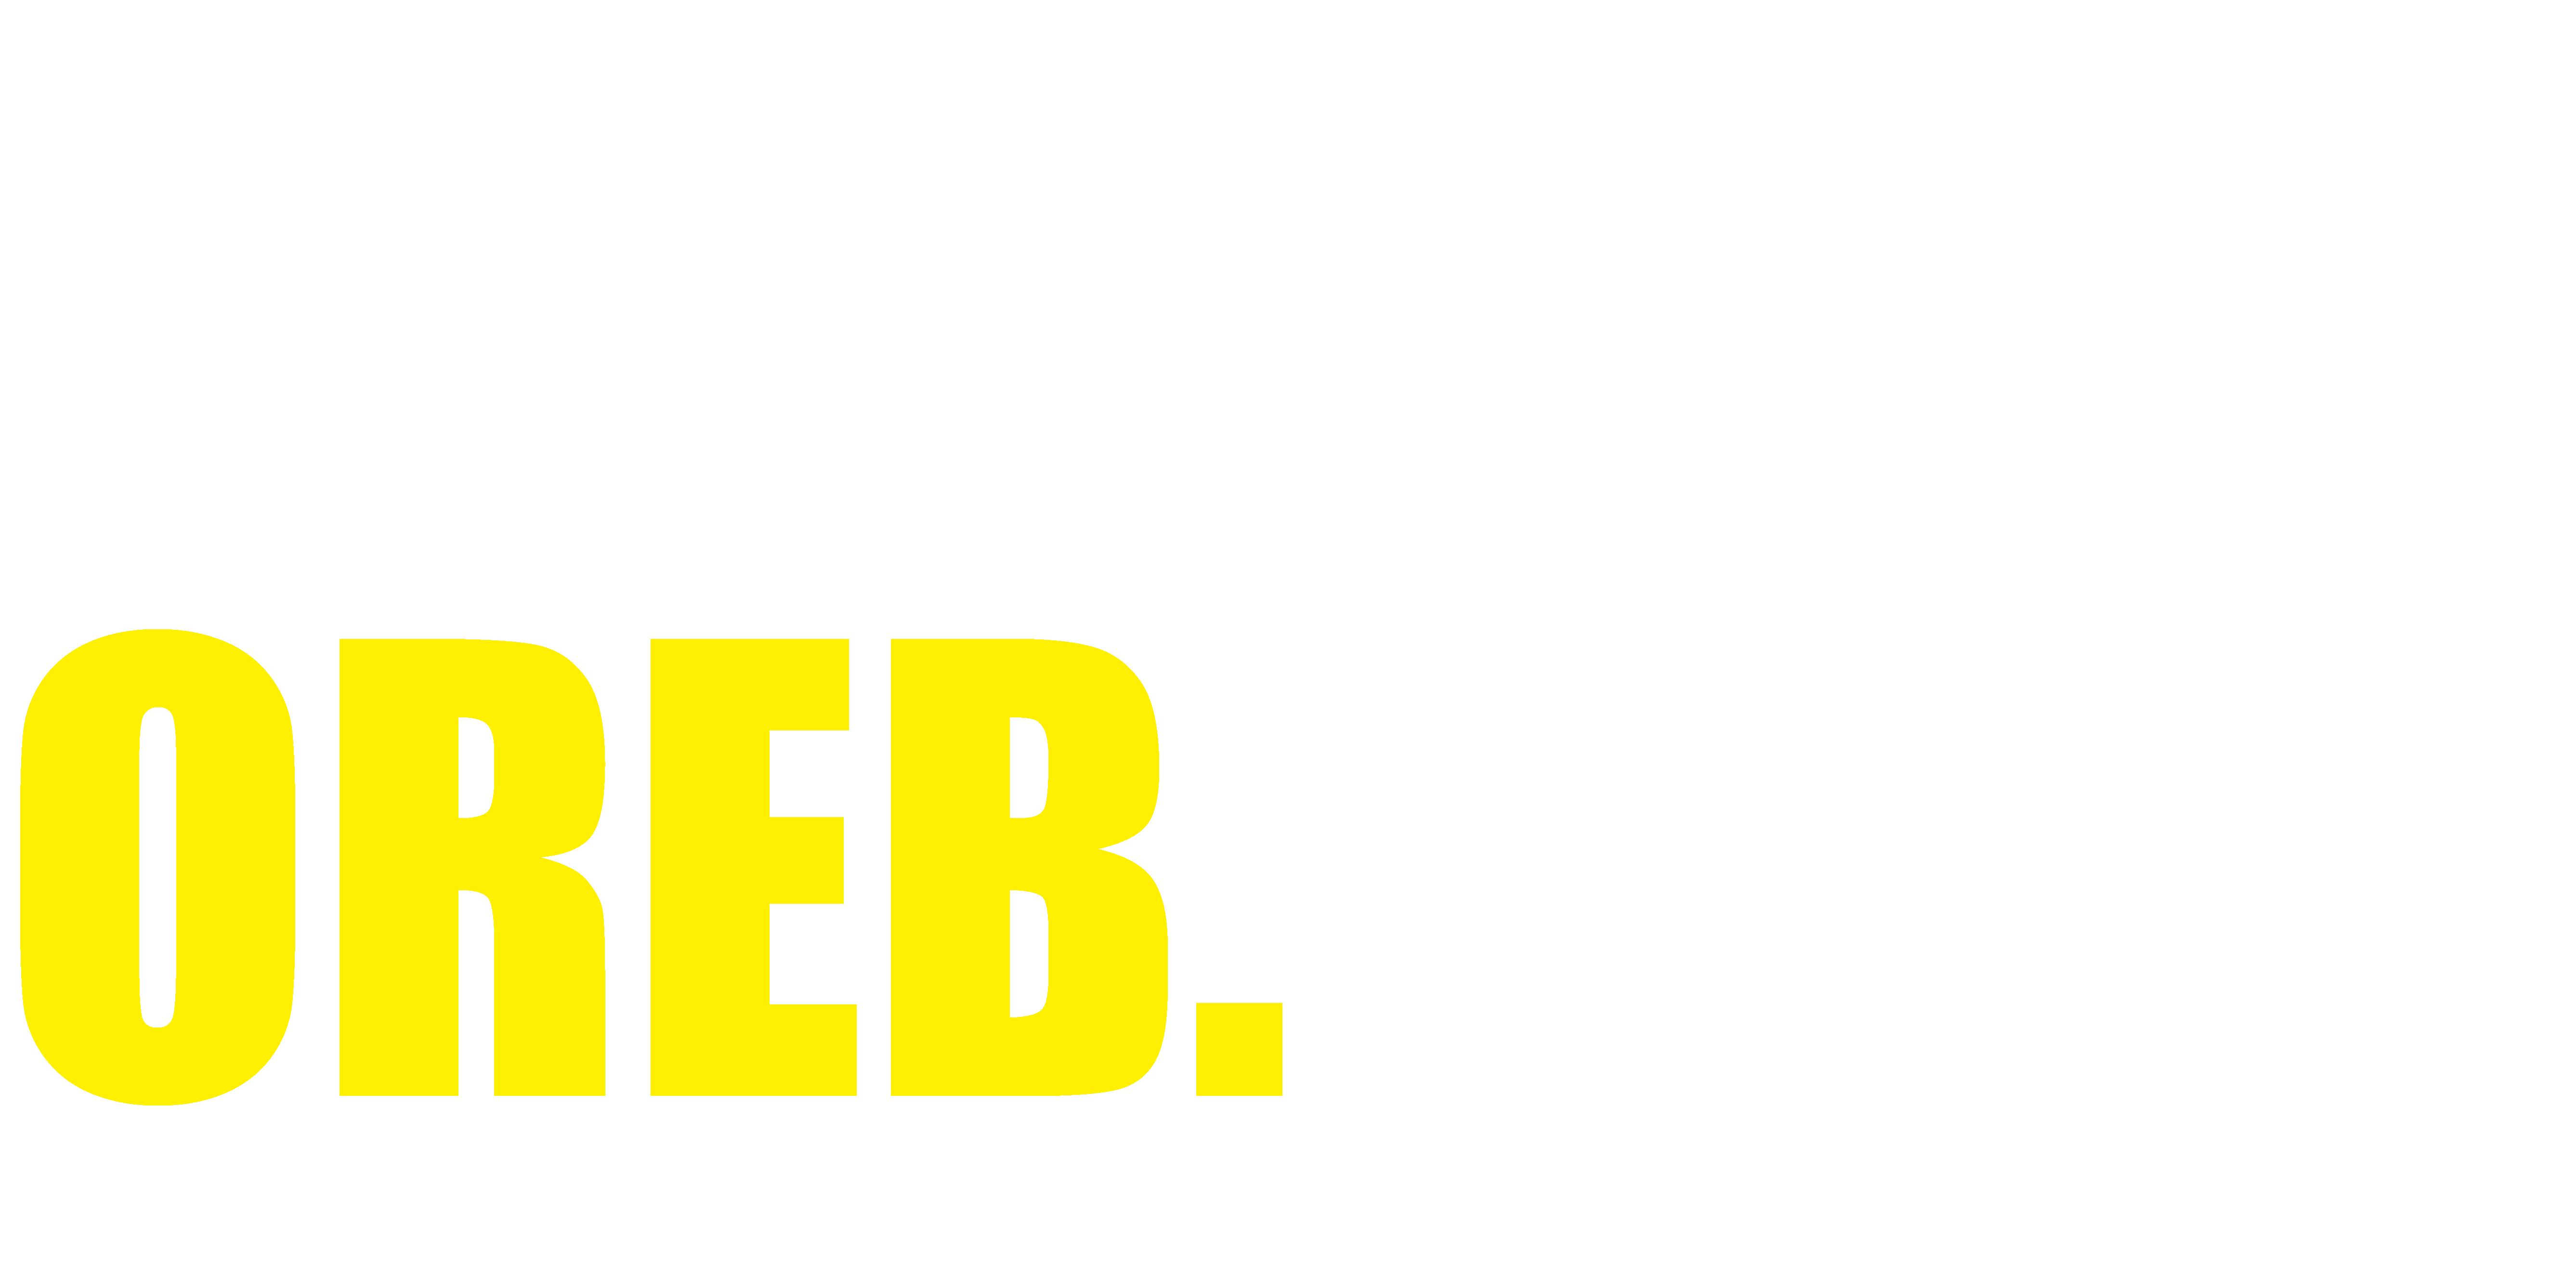 Sebastian Oreb